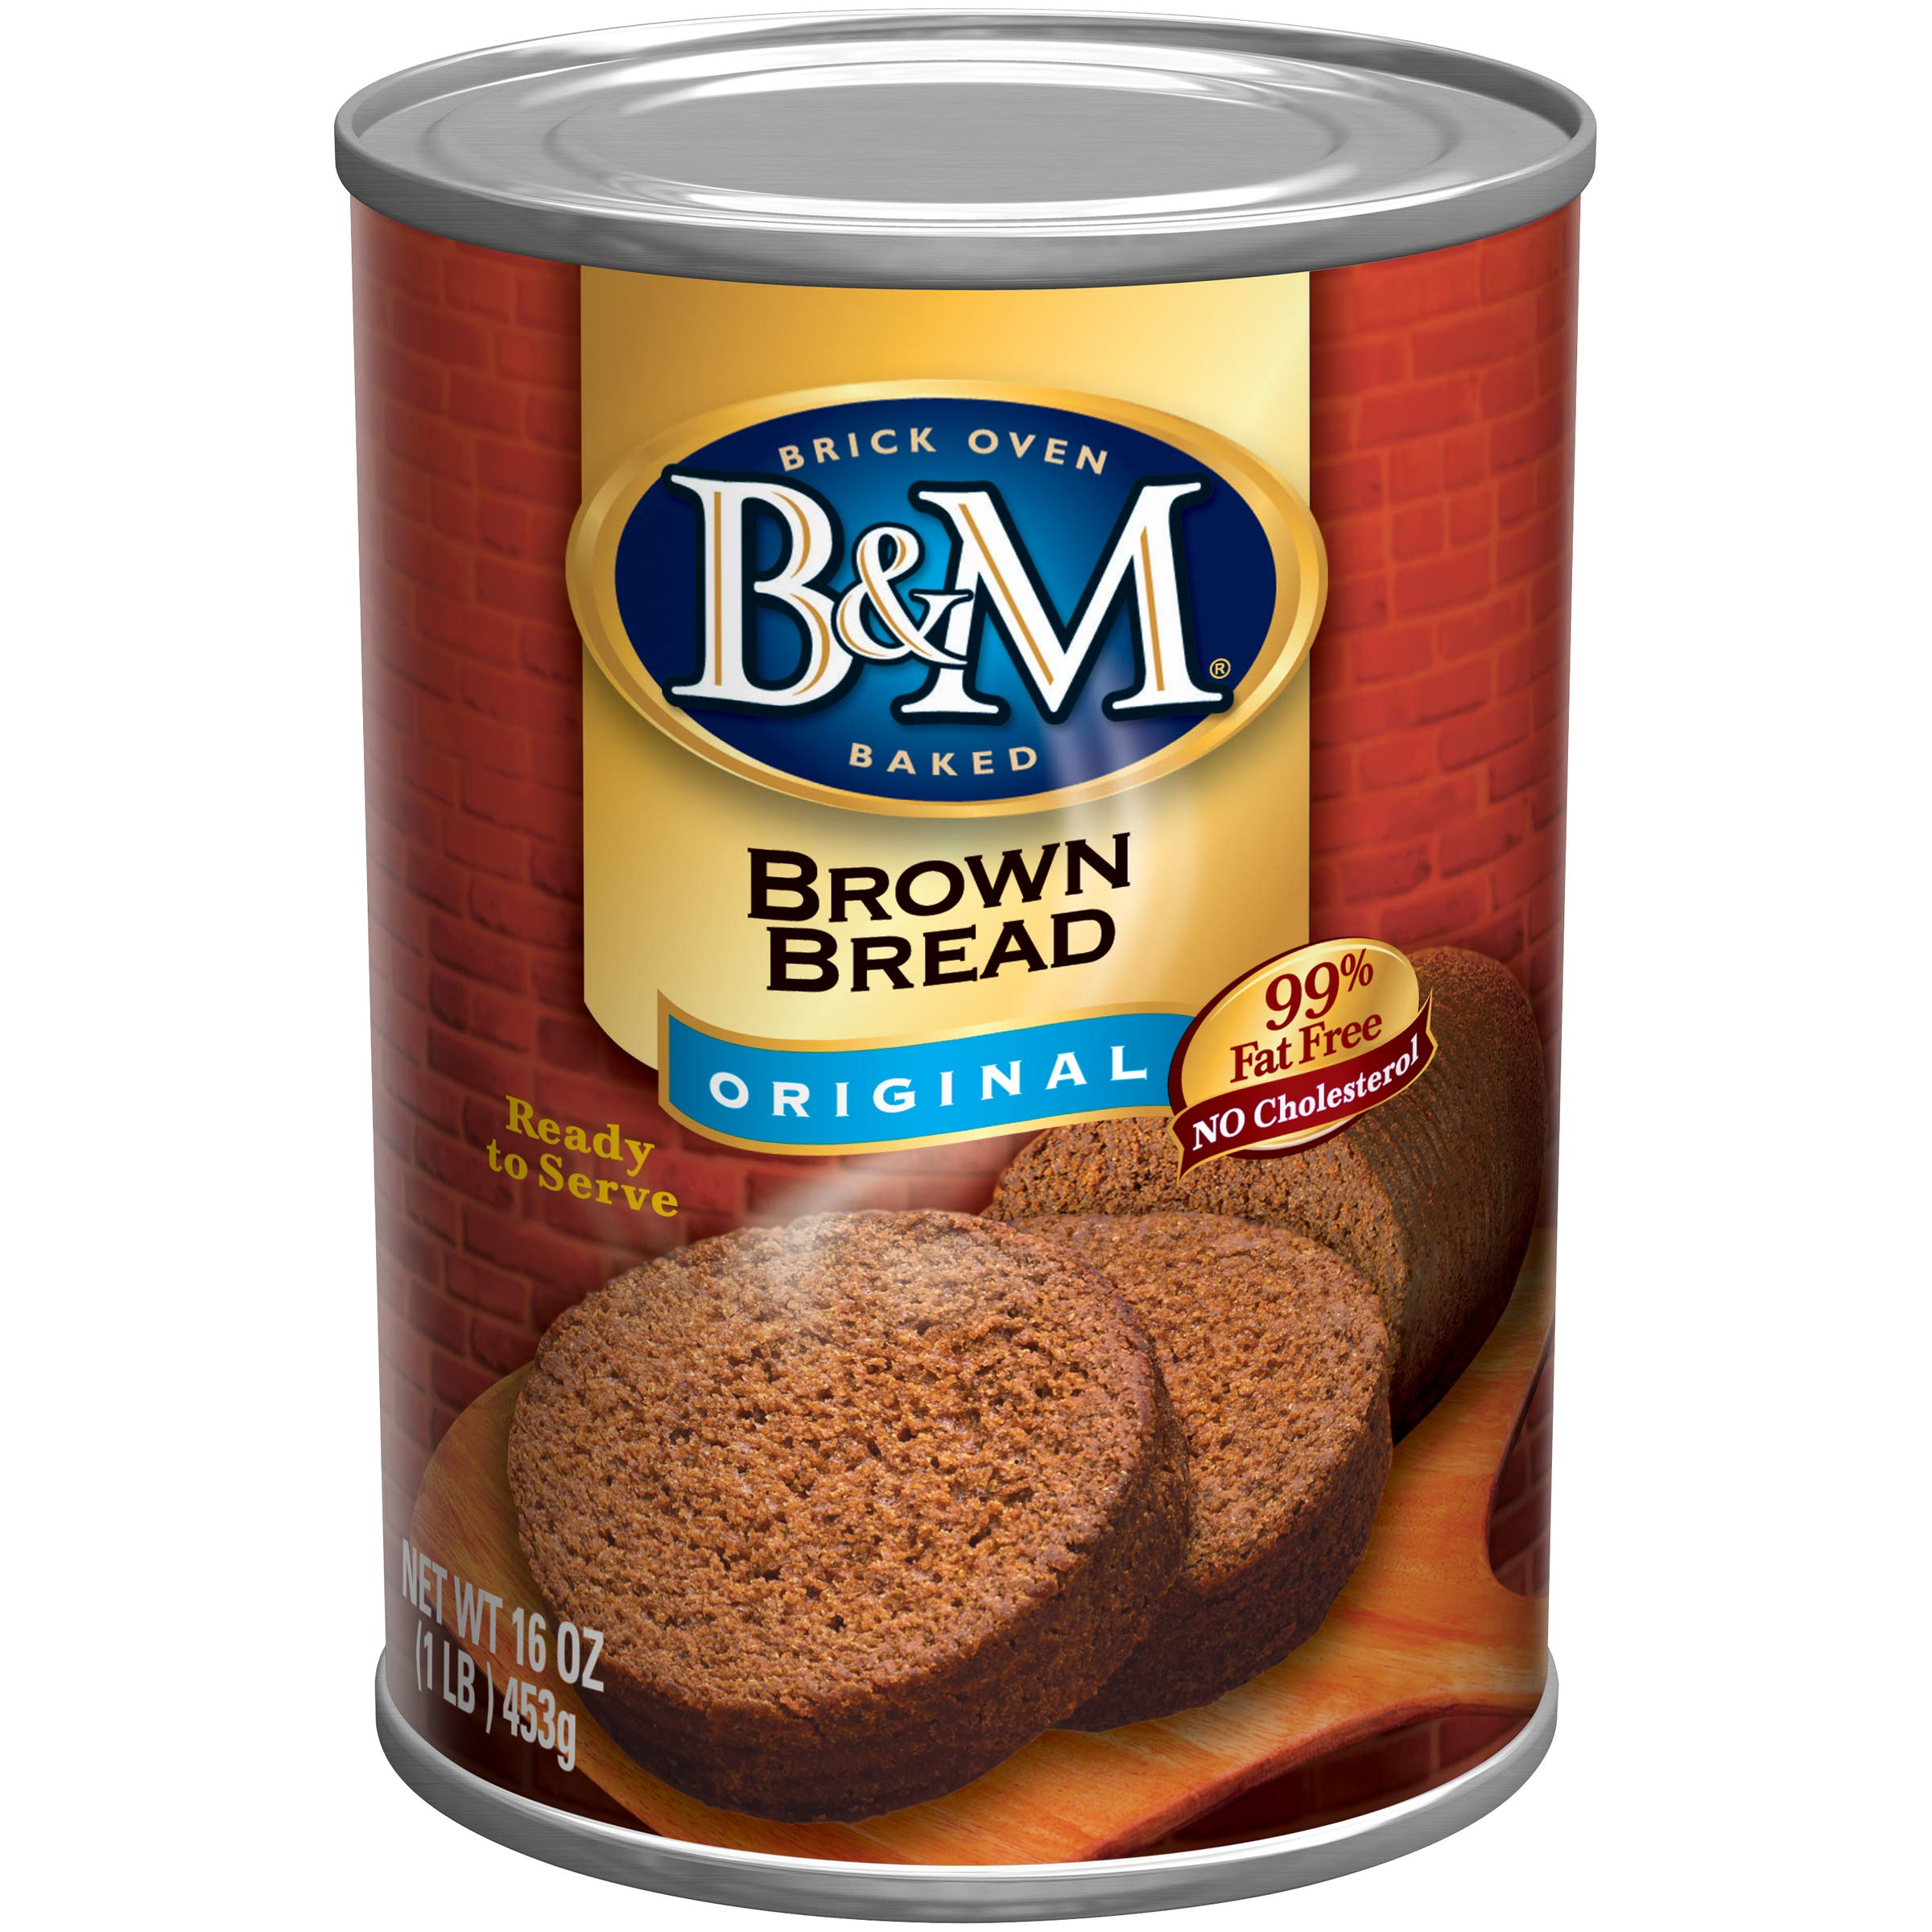 B&M Brown Bread, Original Flavor, 16 Ounce (Pack of 12)